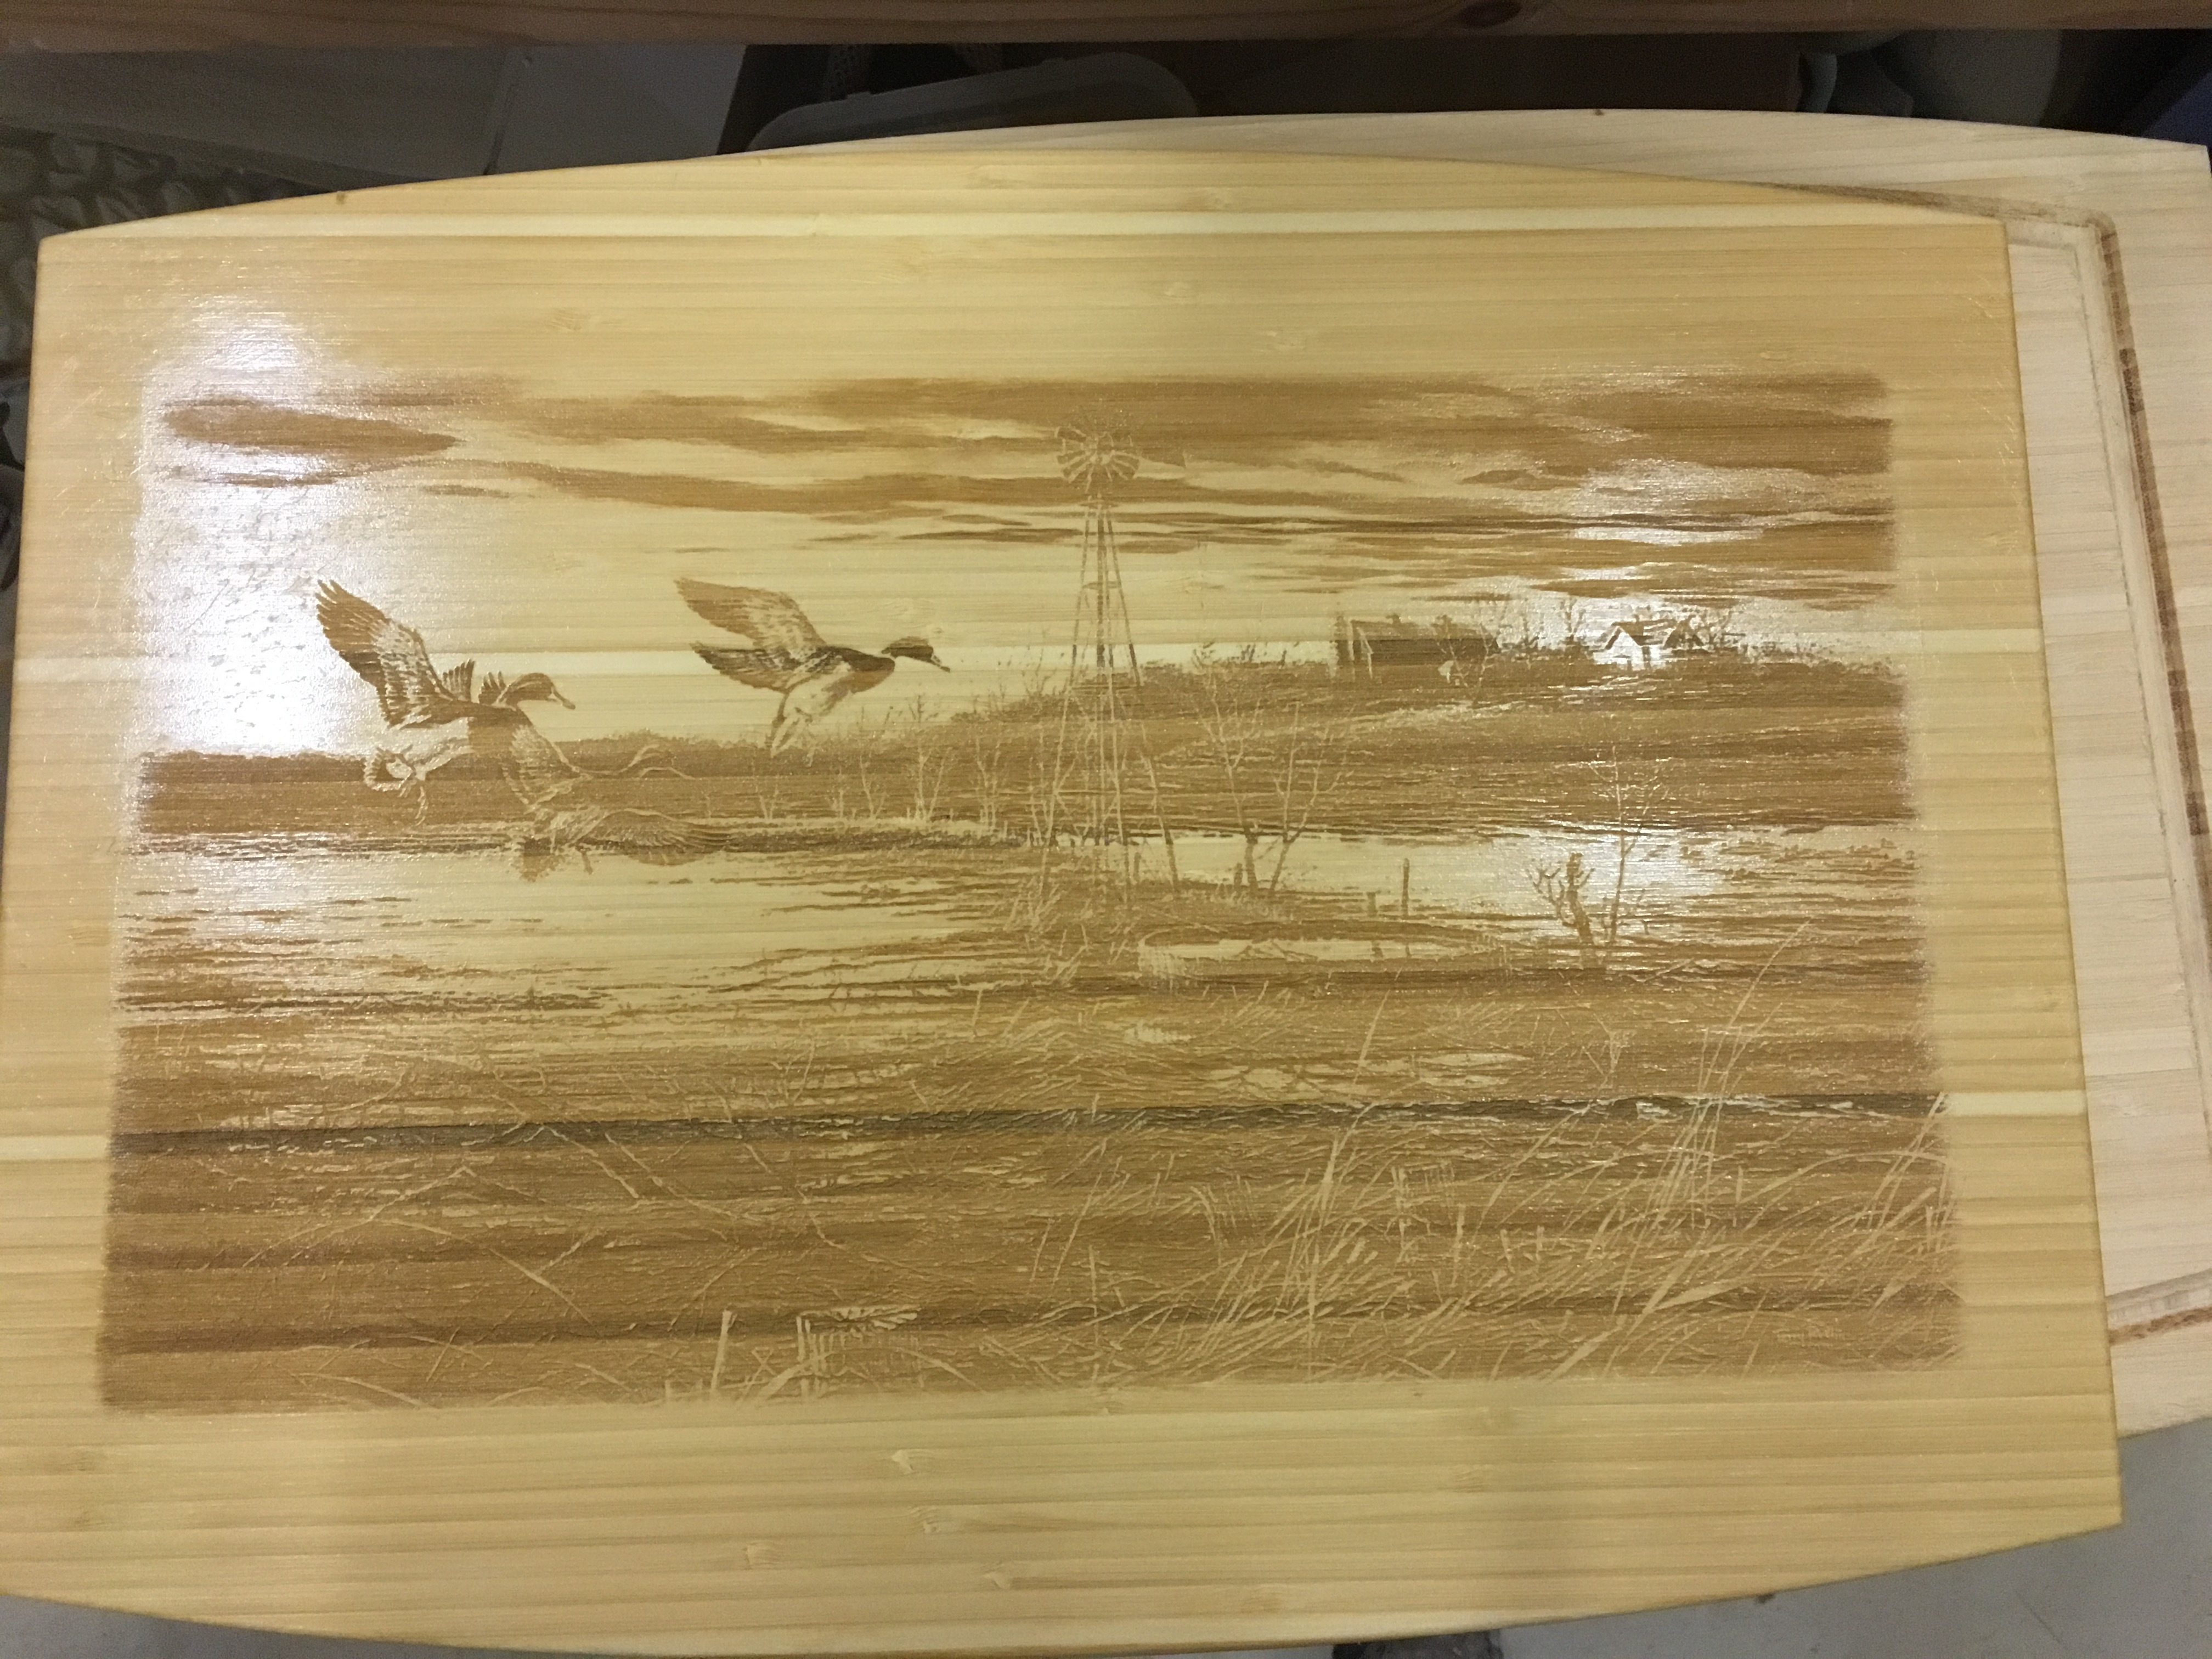 cutting-board-ducks.jpg